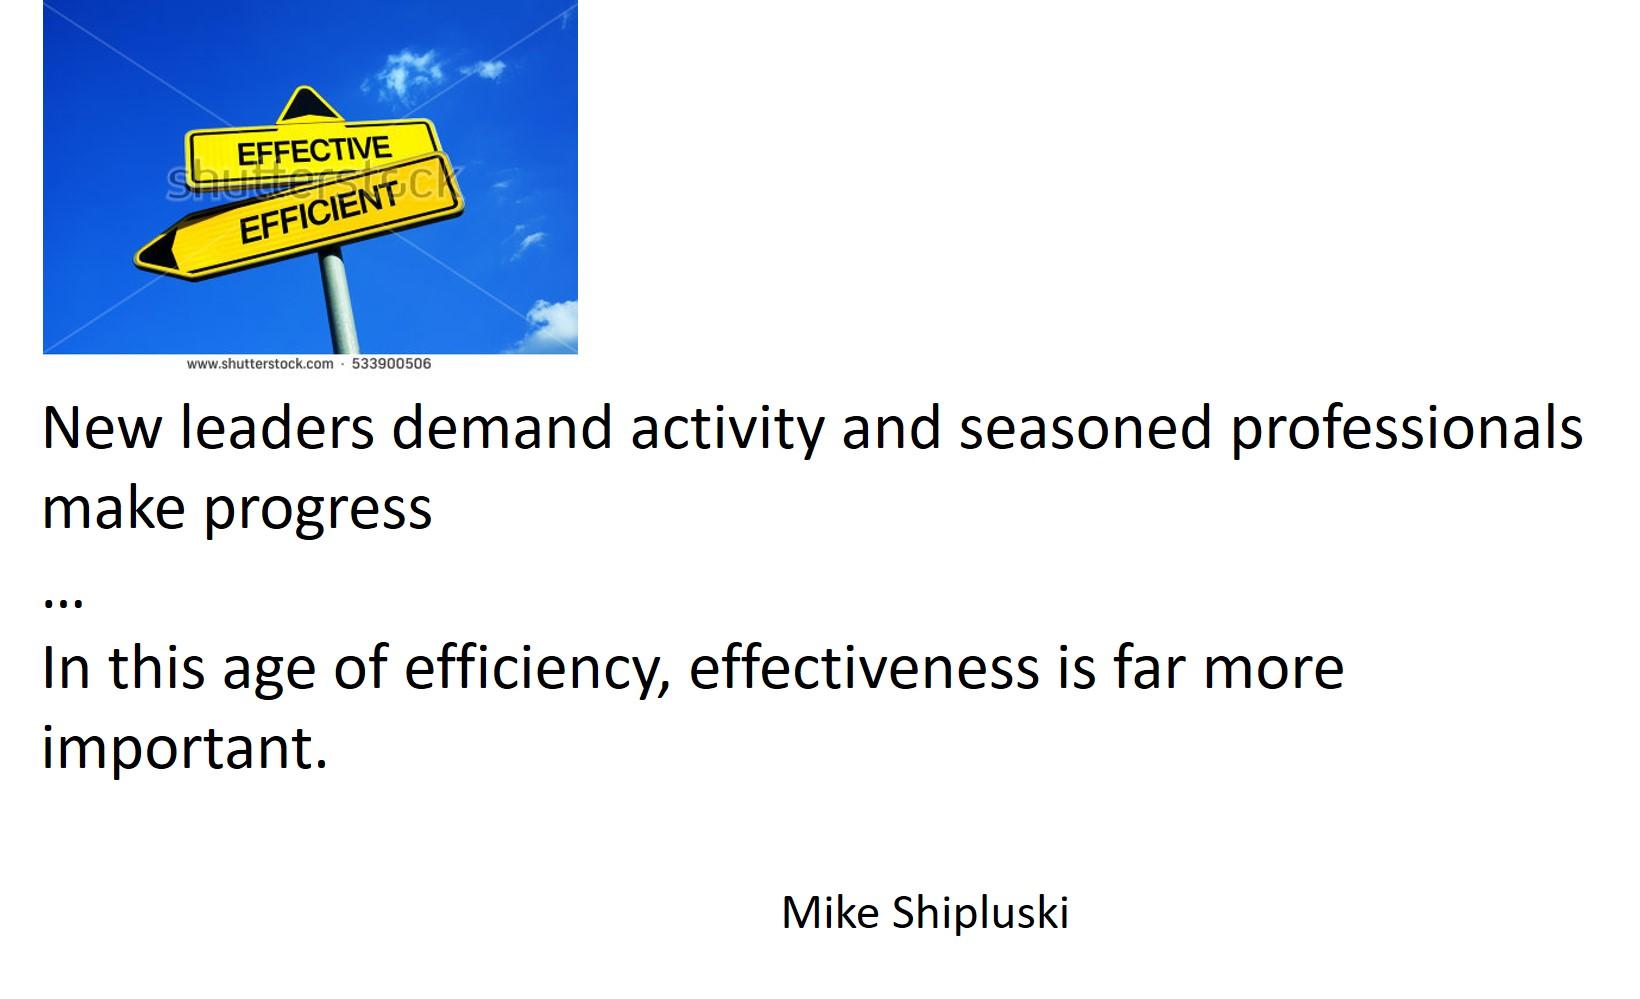 Mike Shipluski